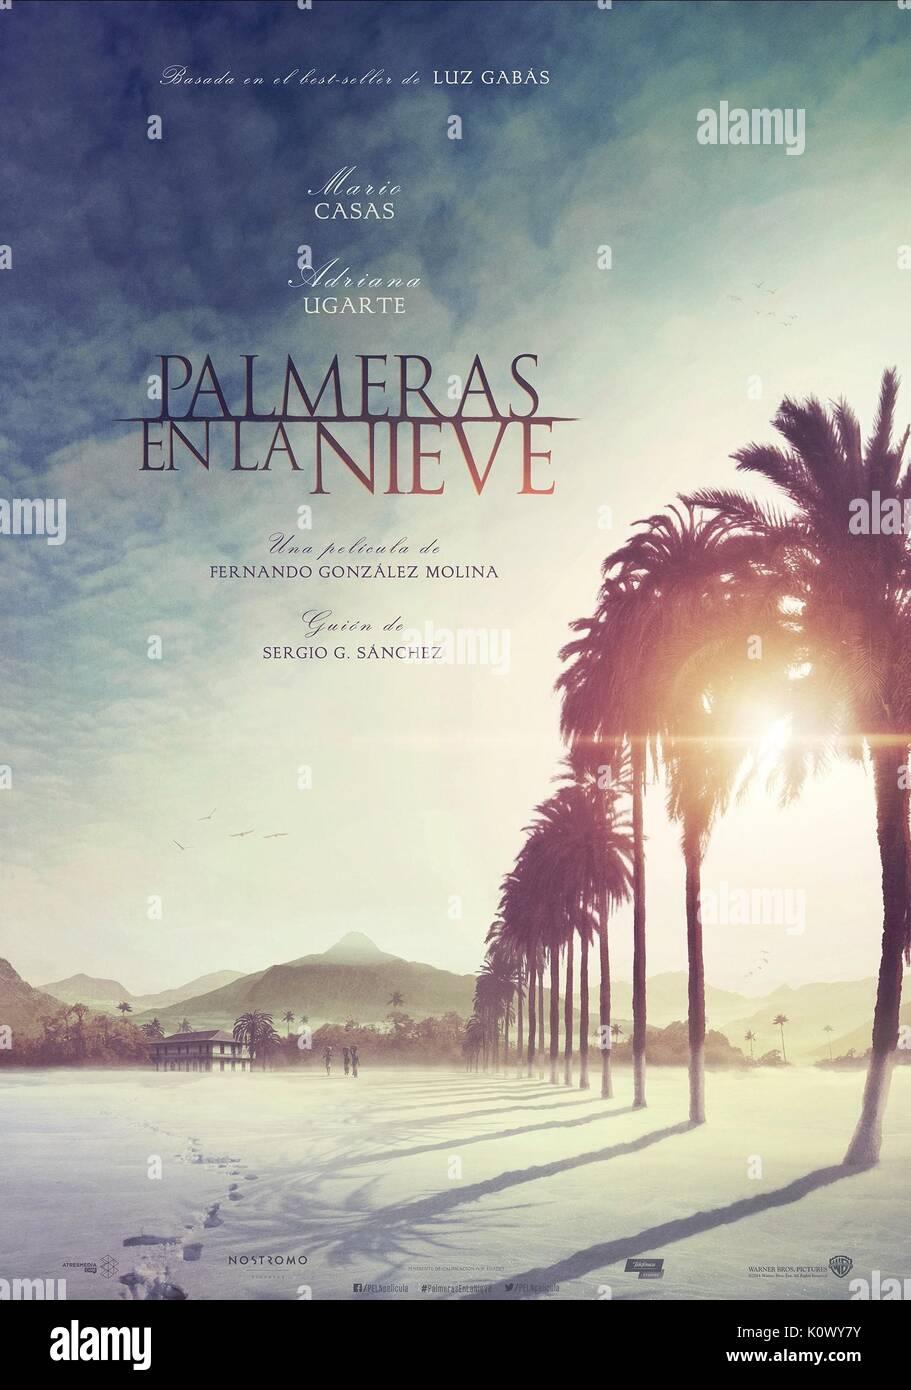 MOVIE POSTER PALM TREES IN THE SNOW; PALMERAS EN LA NIEVE (2015) - Stock Image